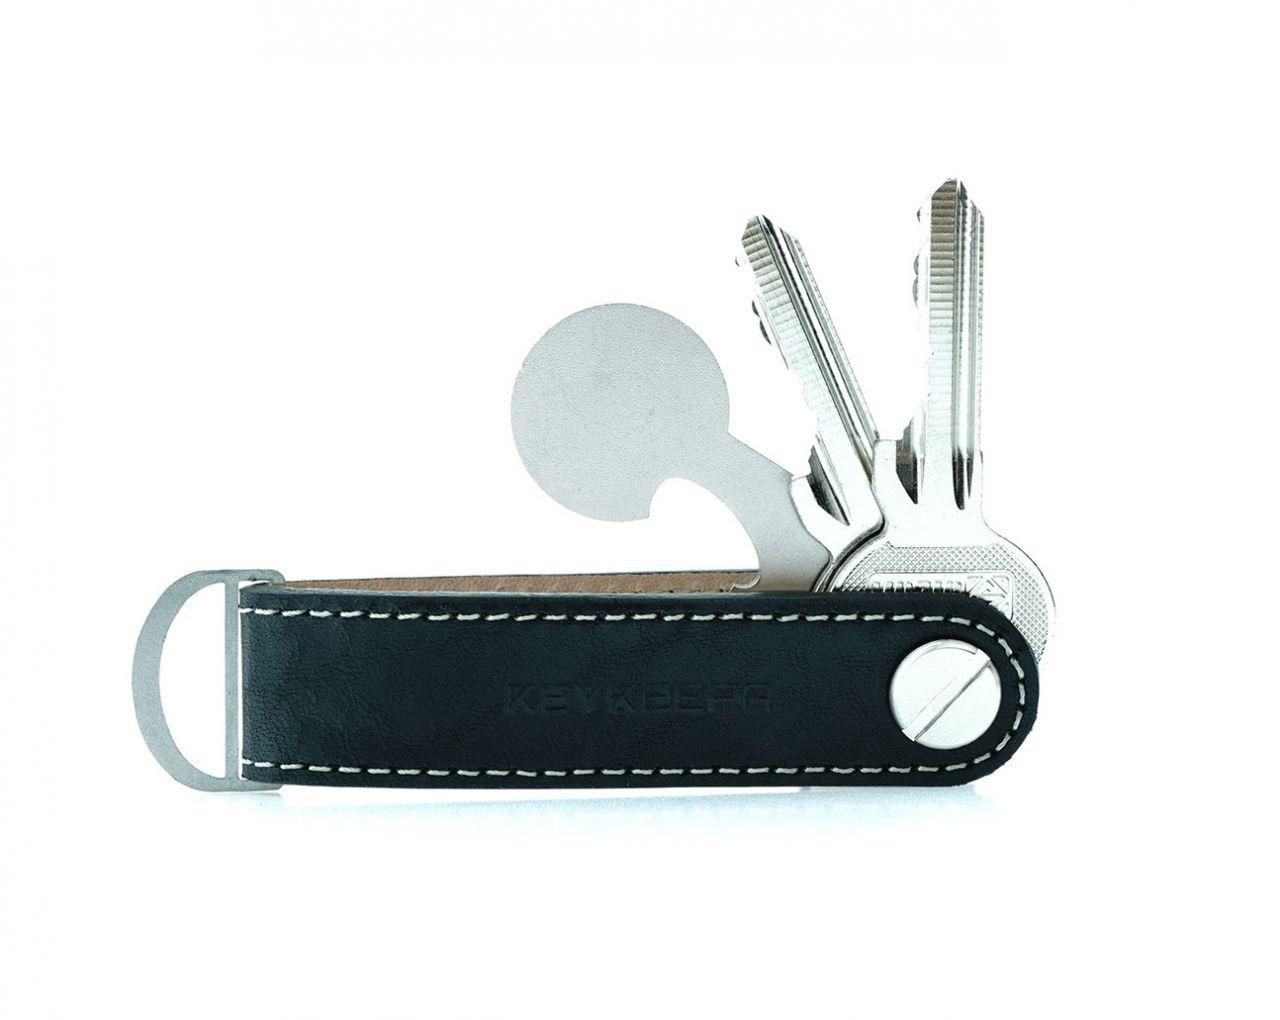 _ Keykeepa Schlüsselorganizer Leder Loop - Phantom Black